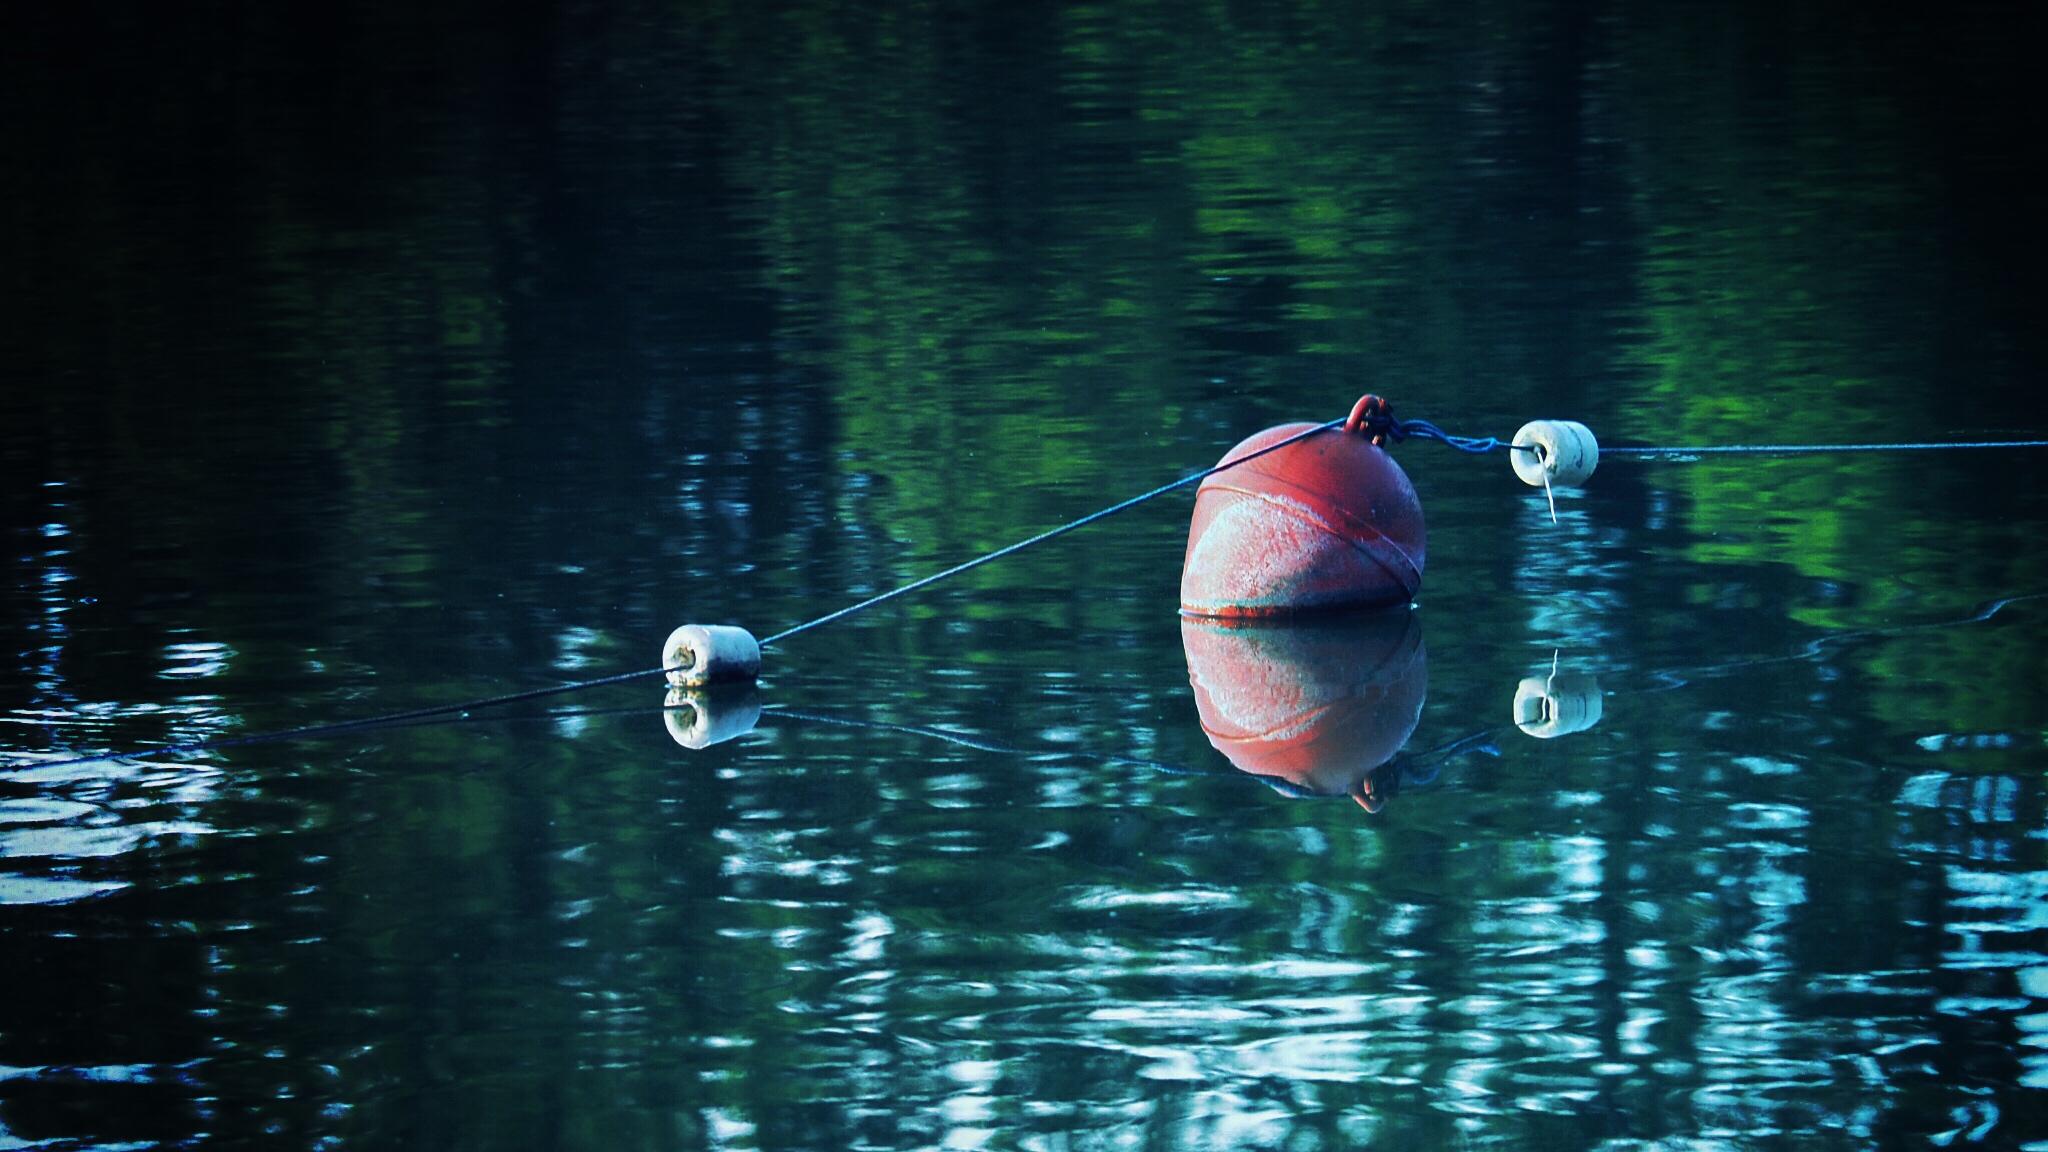 Boje auf dem großen Teich im Kurpark